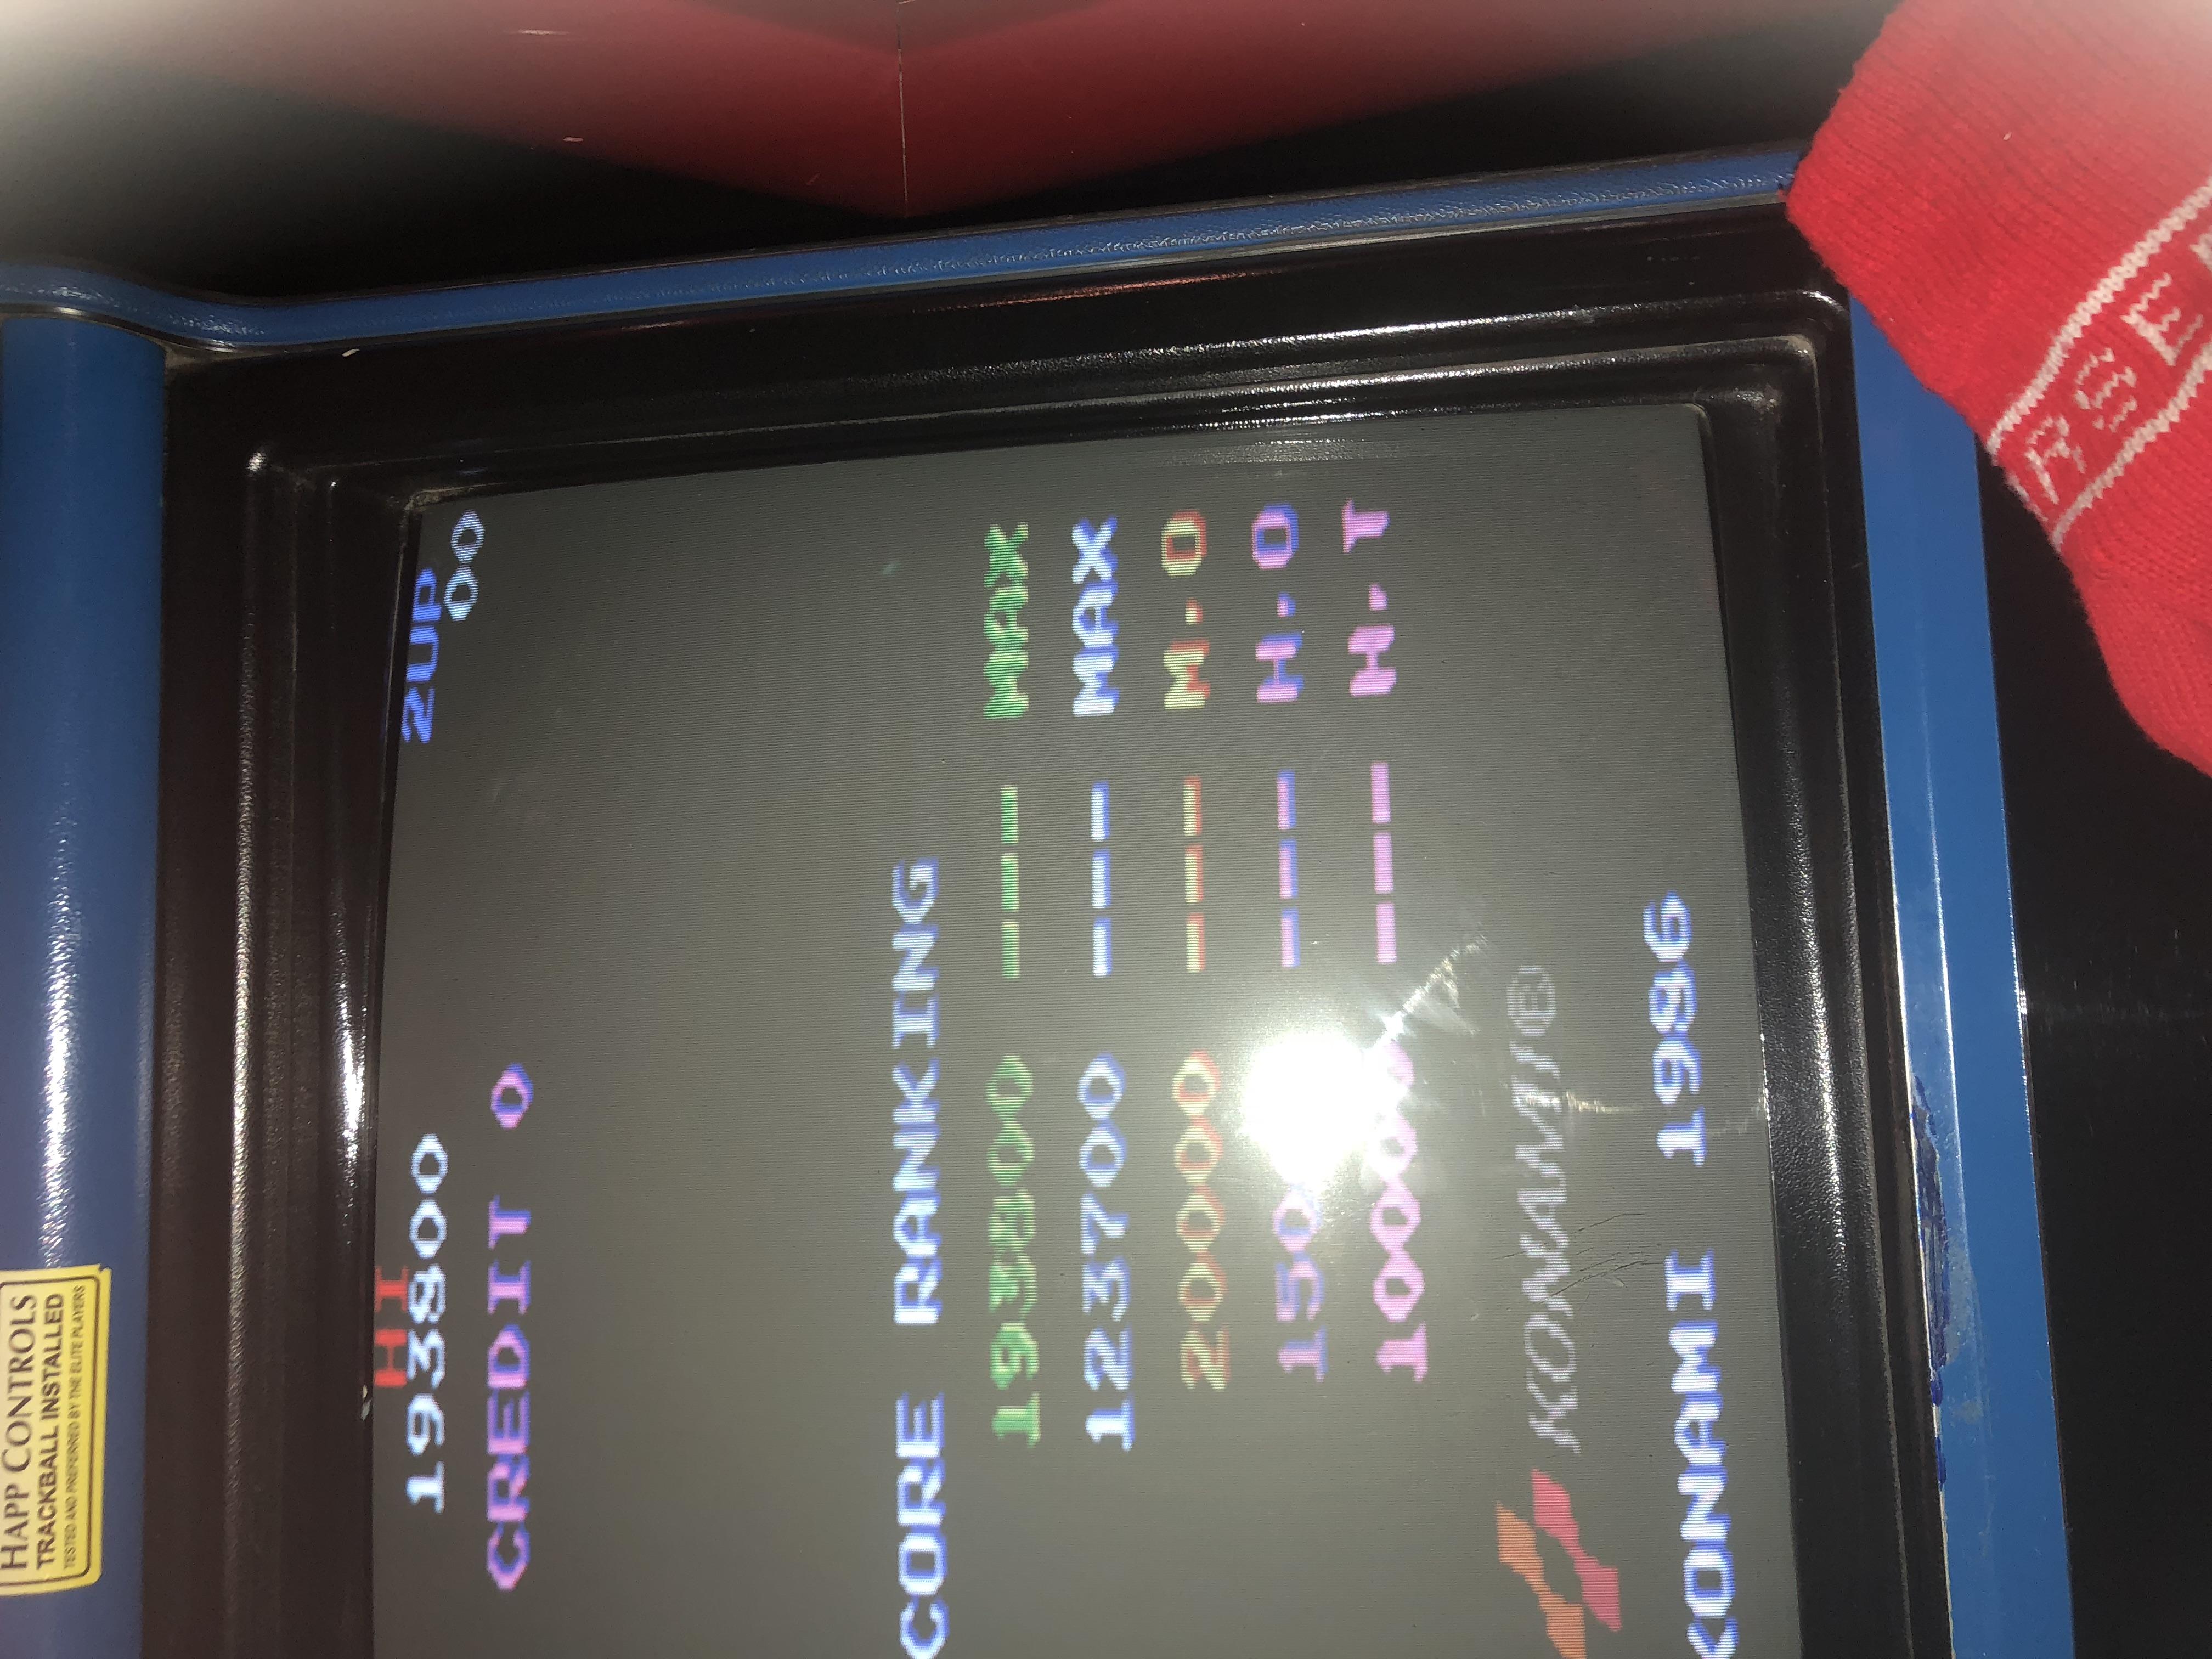 Jackal (Arcade) high score by Maxwel